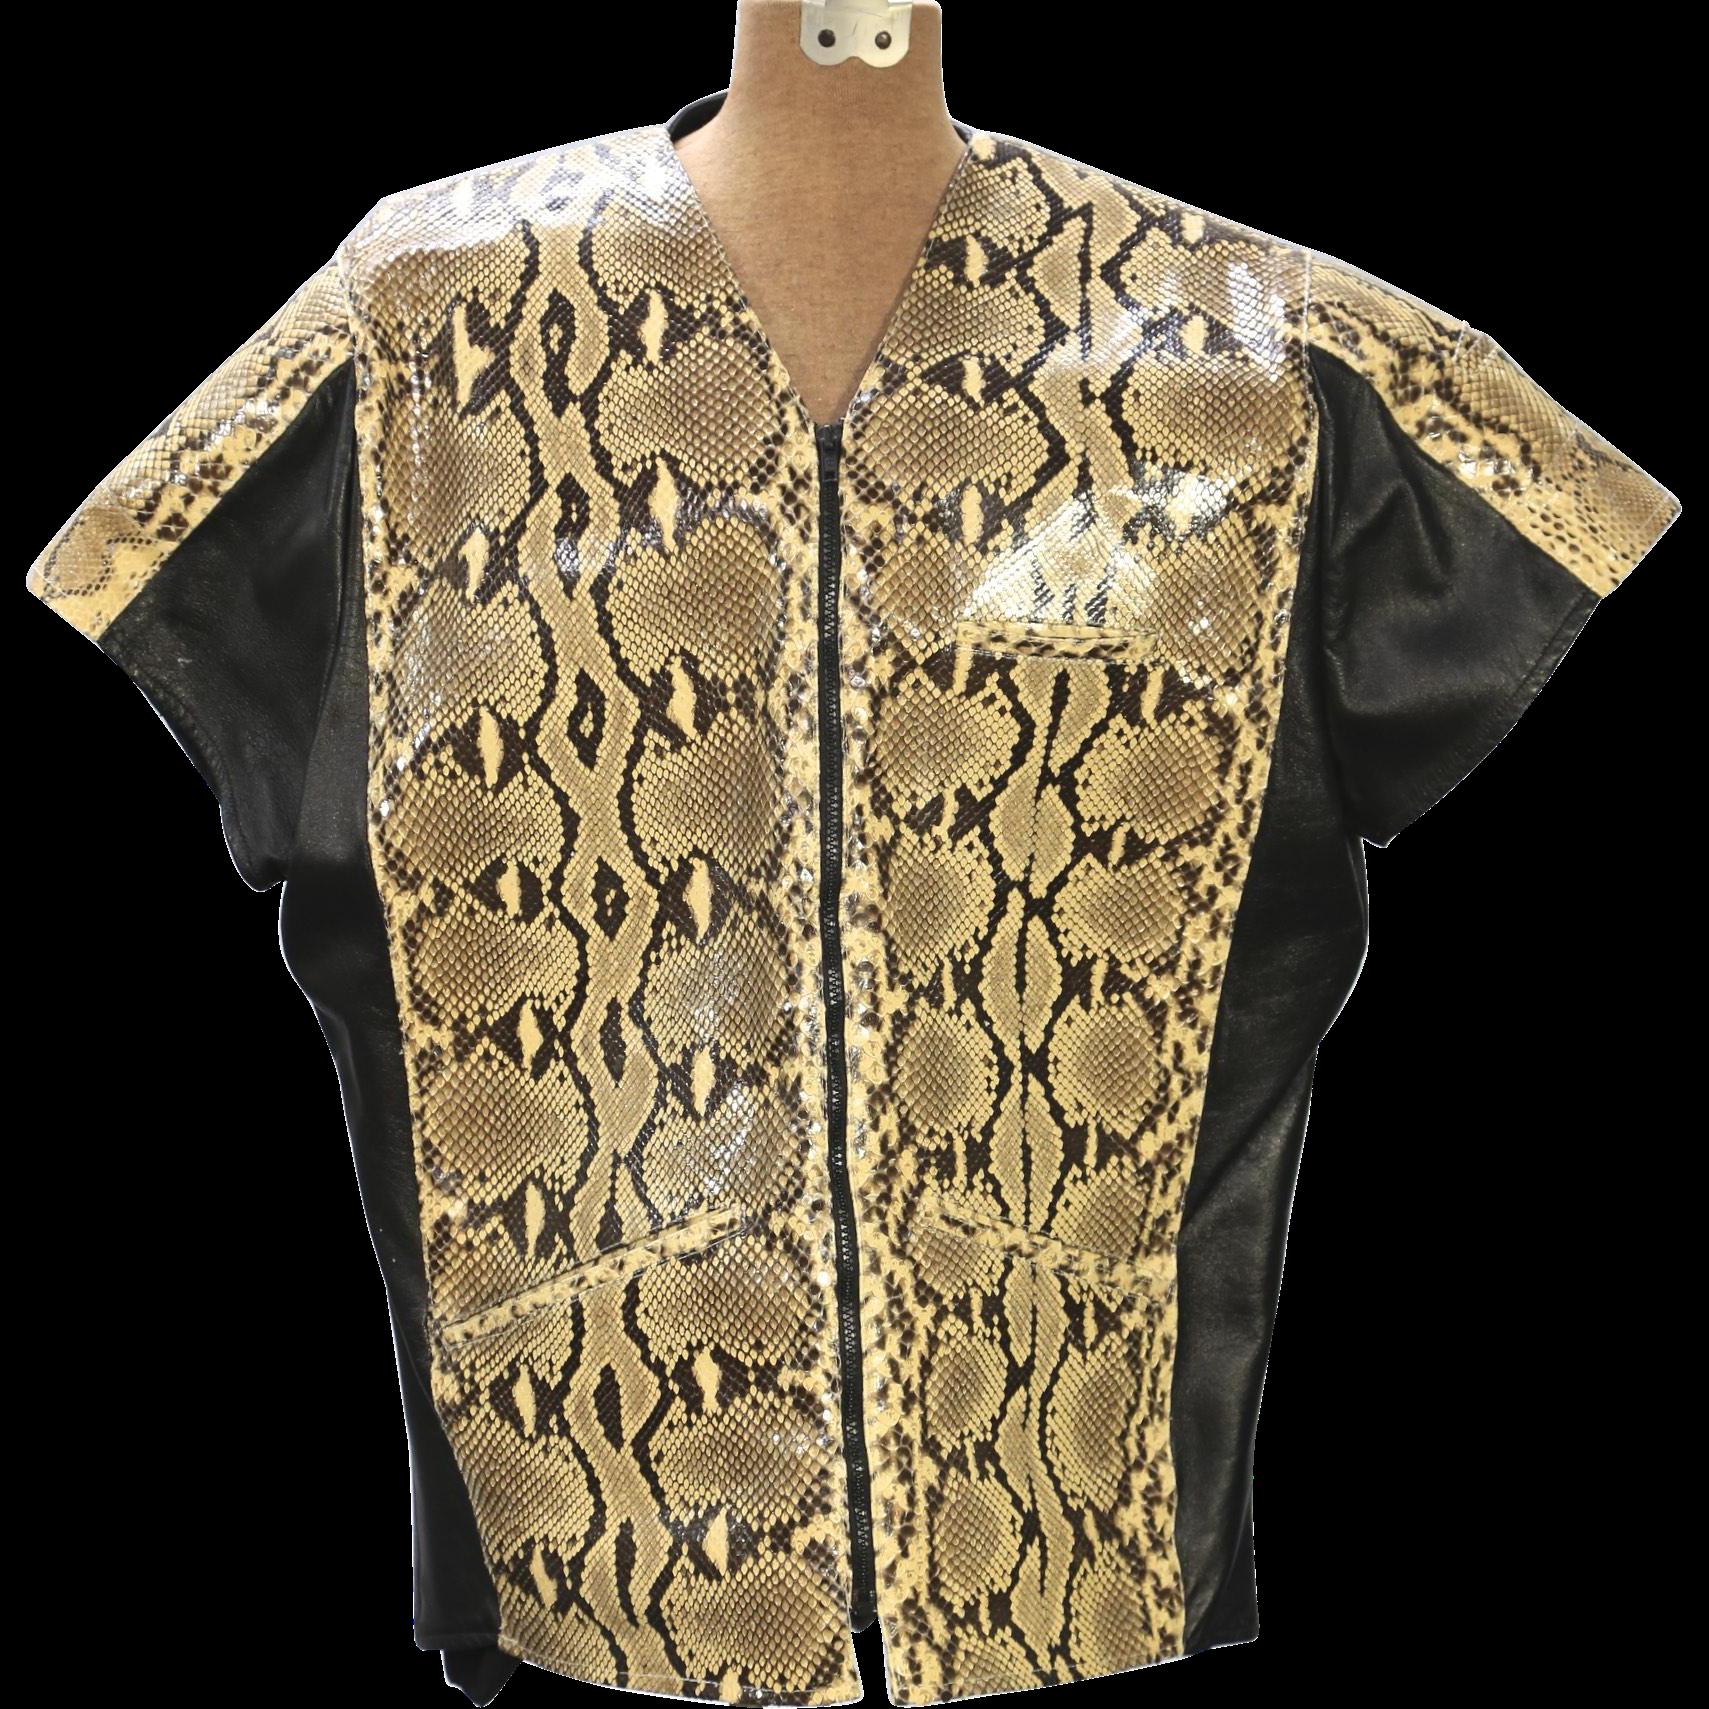 Vintage Real Python Snake Skin Black Leather Jacket Coat Short Sleeve Sz L - XL